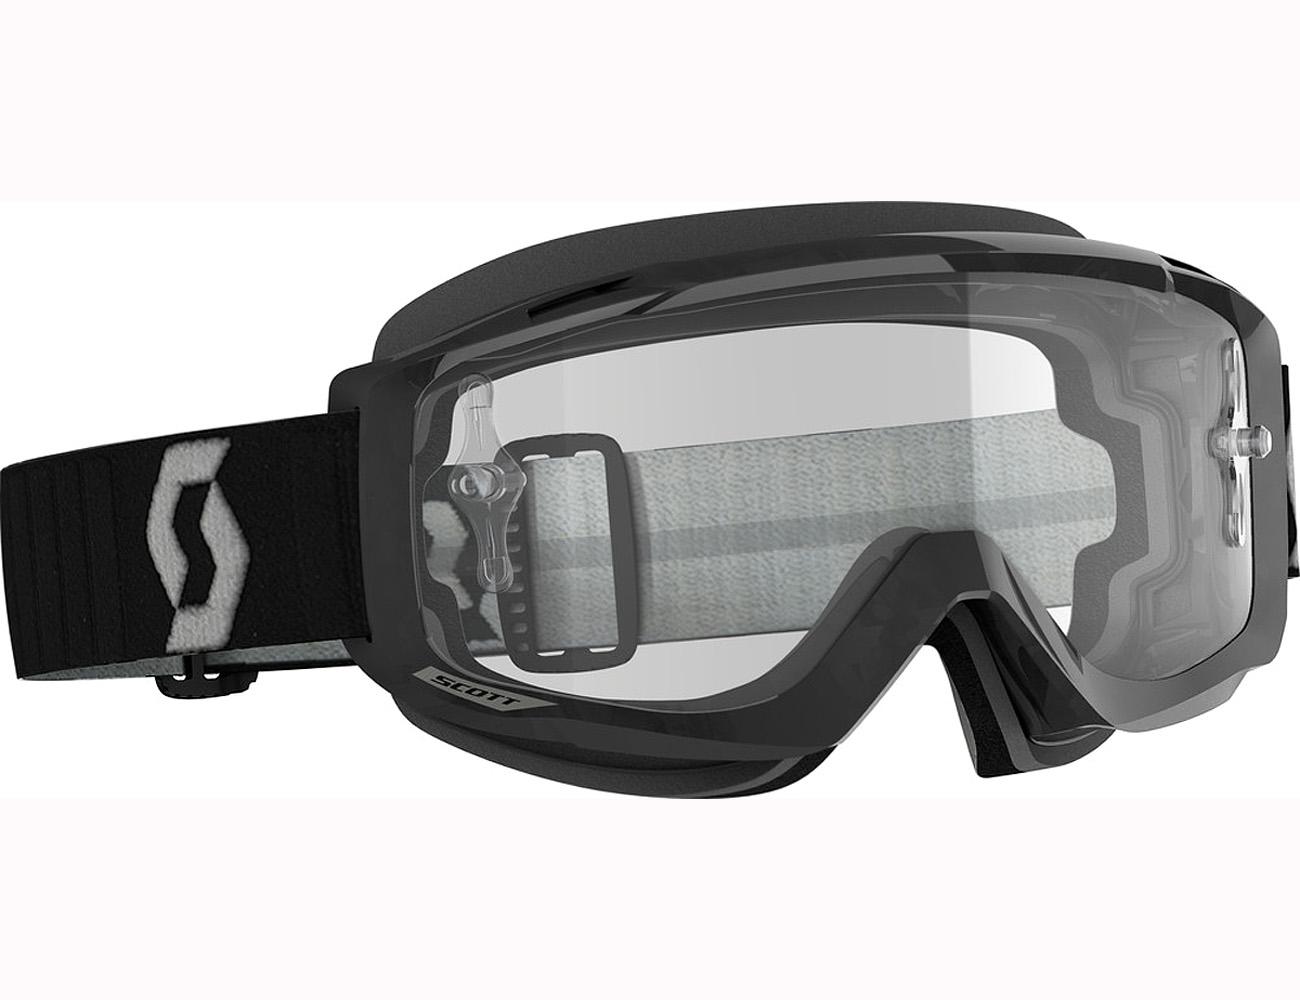 BLACK W//CLEAR LENS 268198-0001043 SCOTT SPLIT OTG SNOW GOGGLE